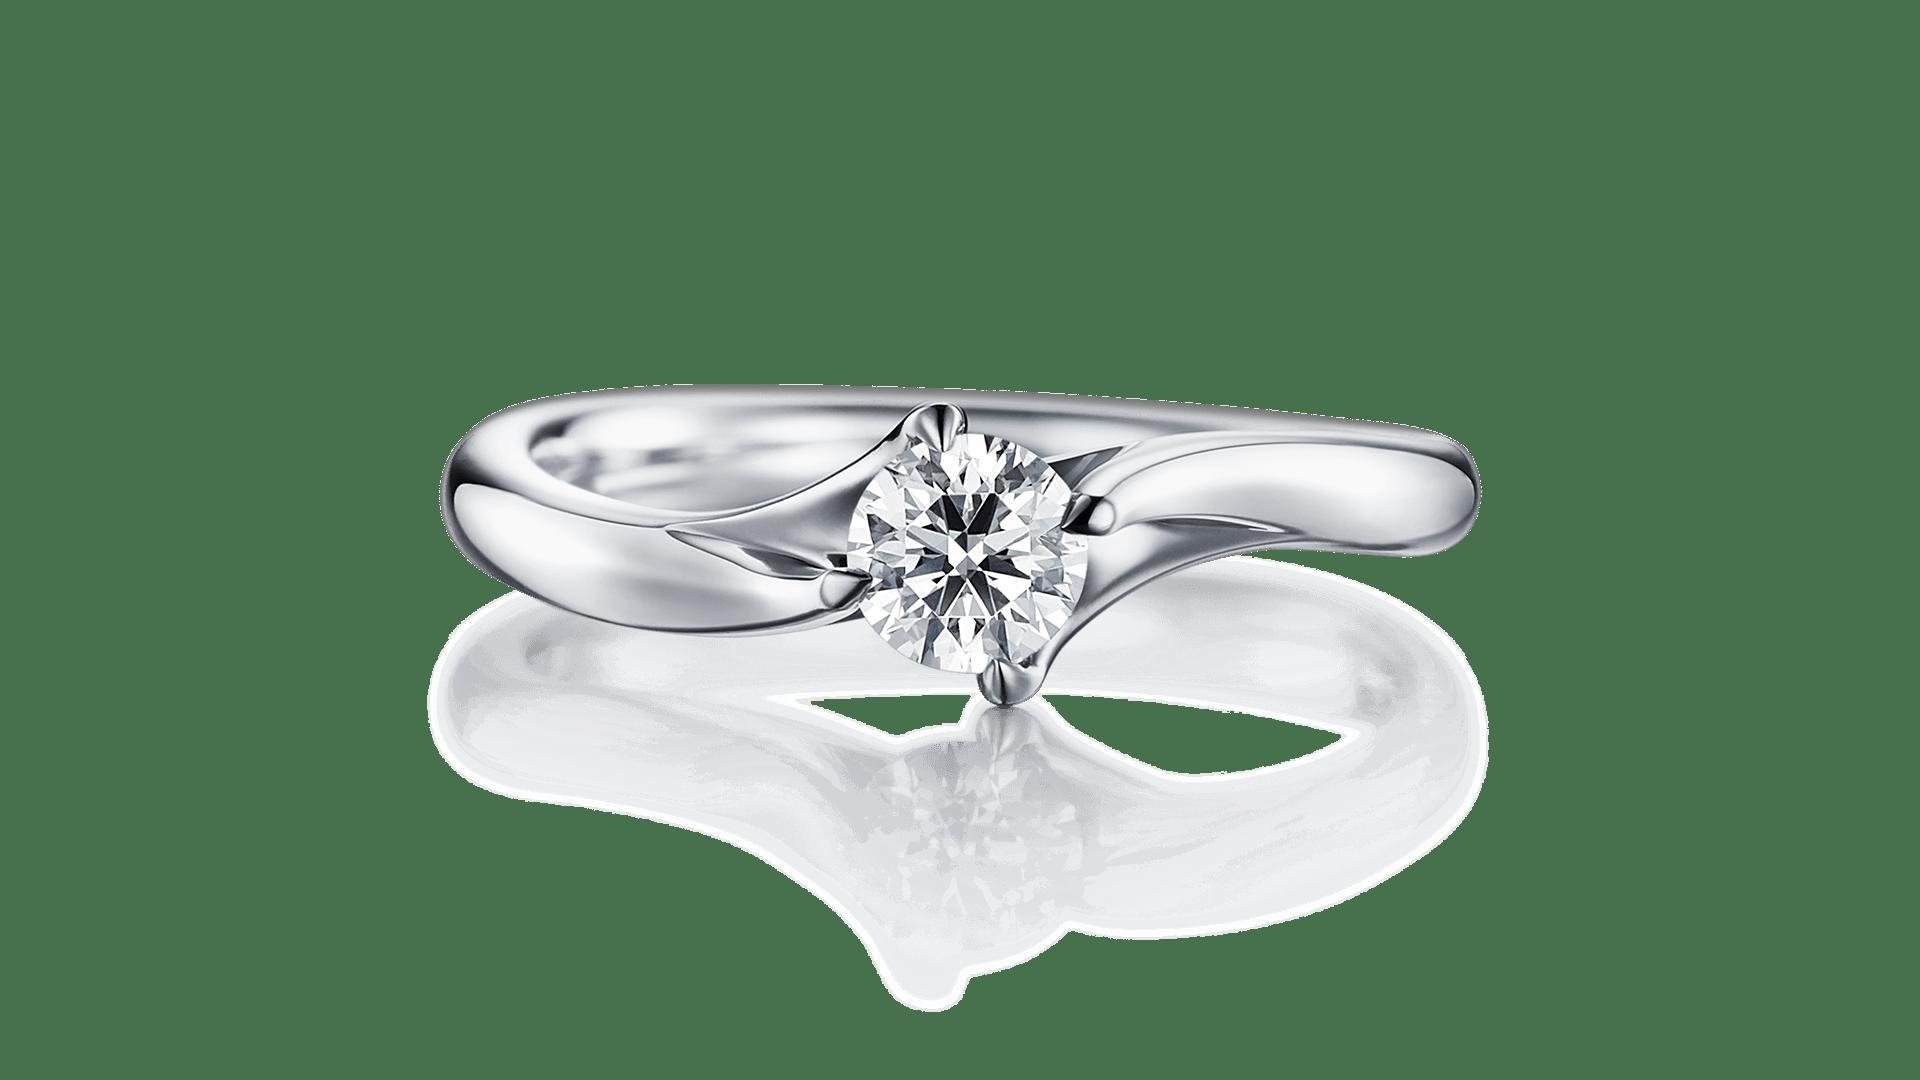 jupiter ジュピター | 婚約指輪サムネイル 1